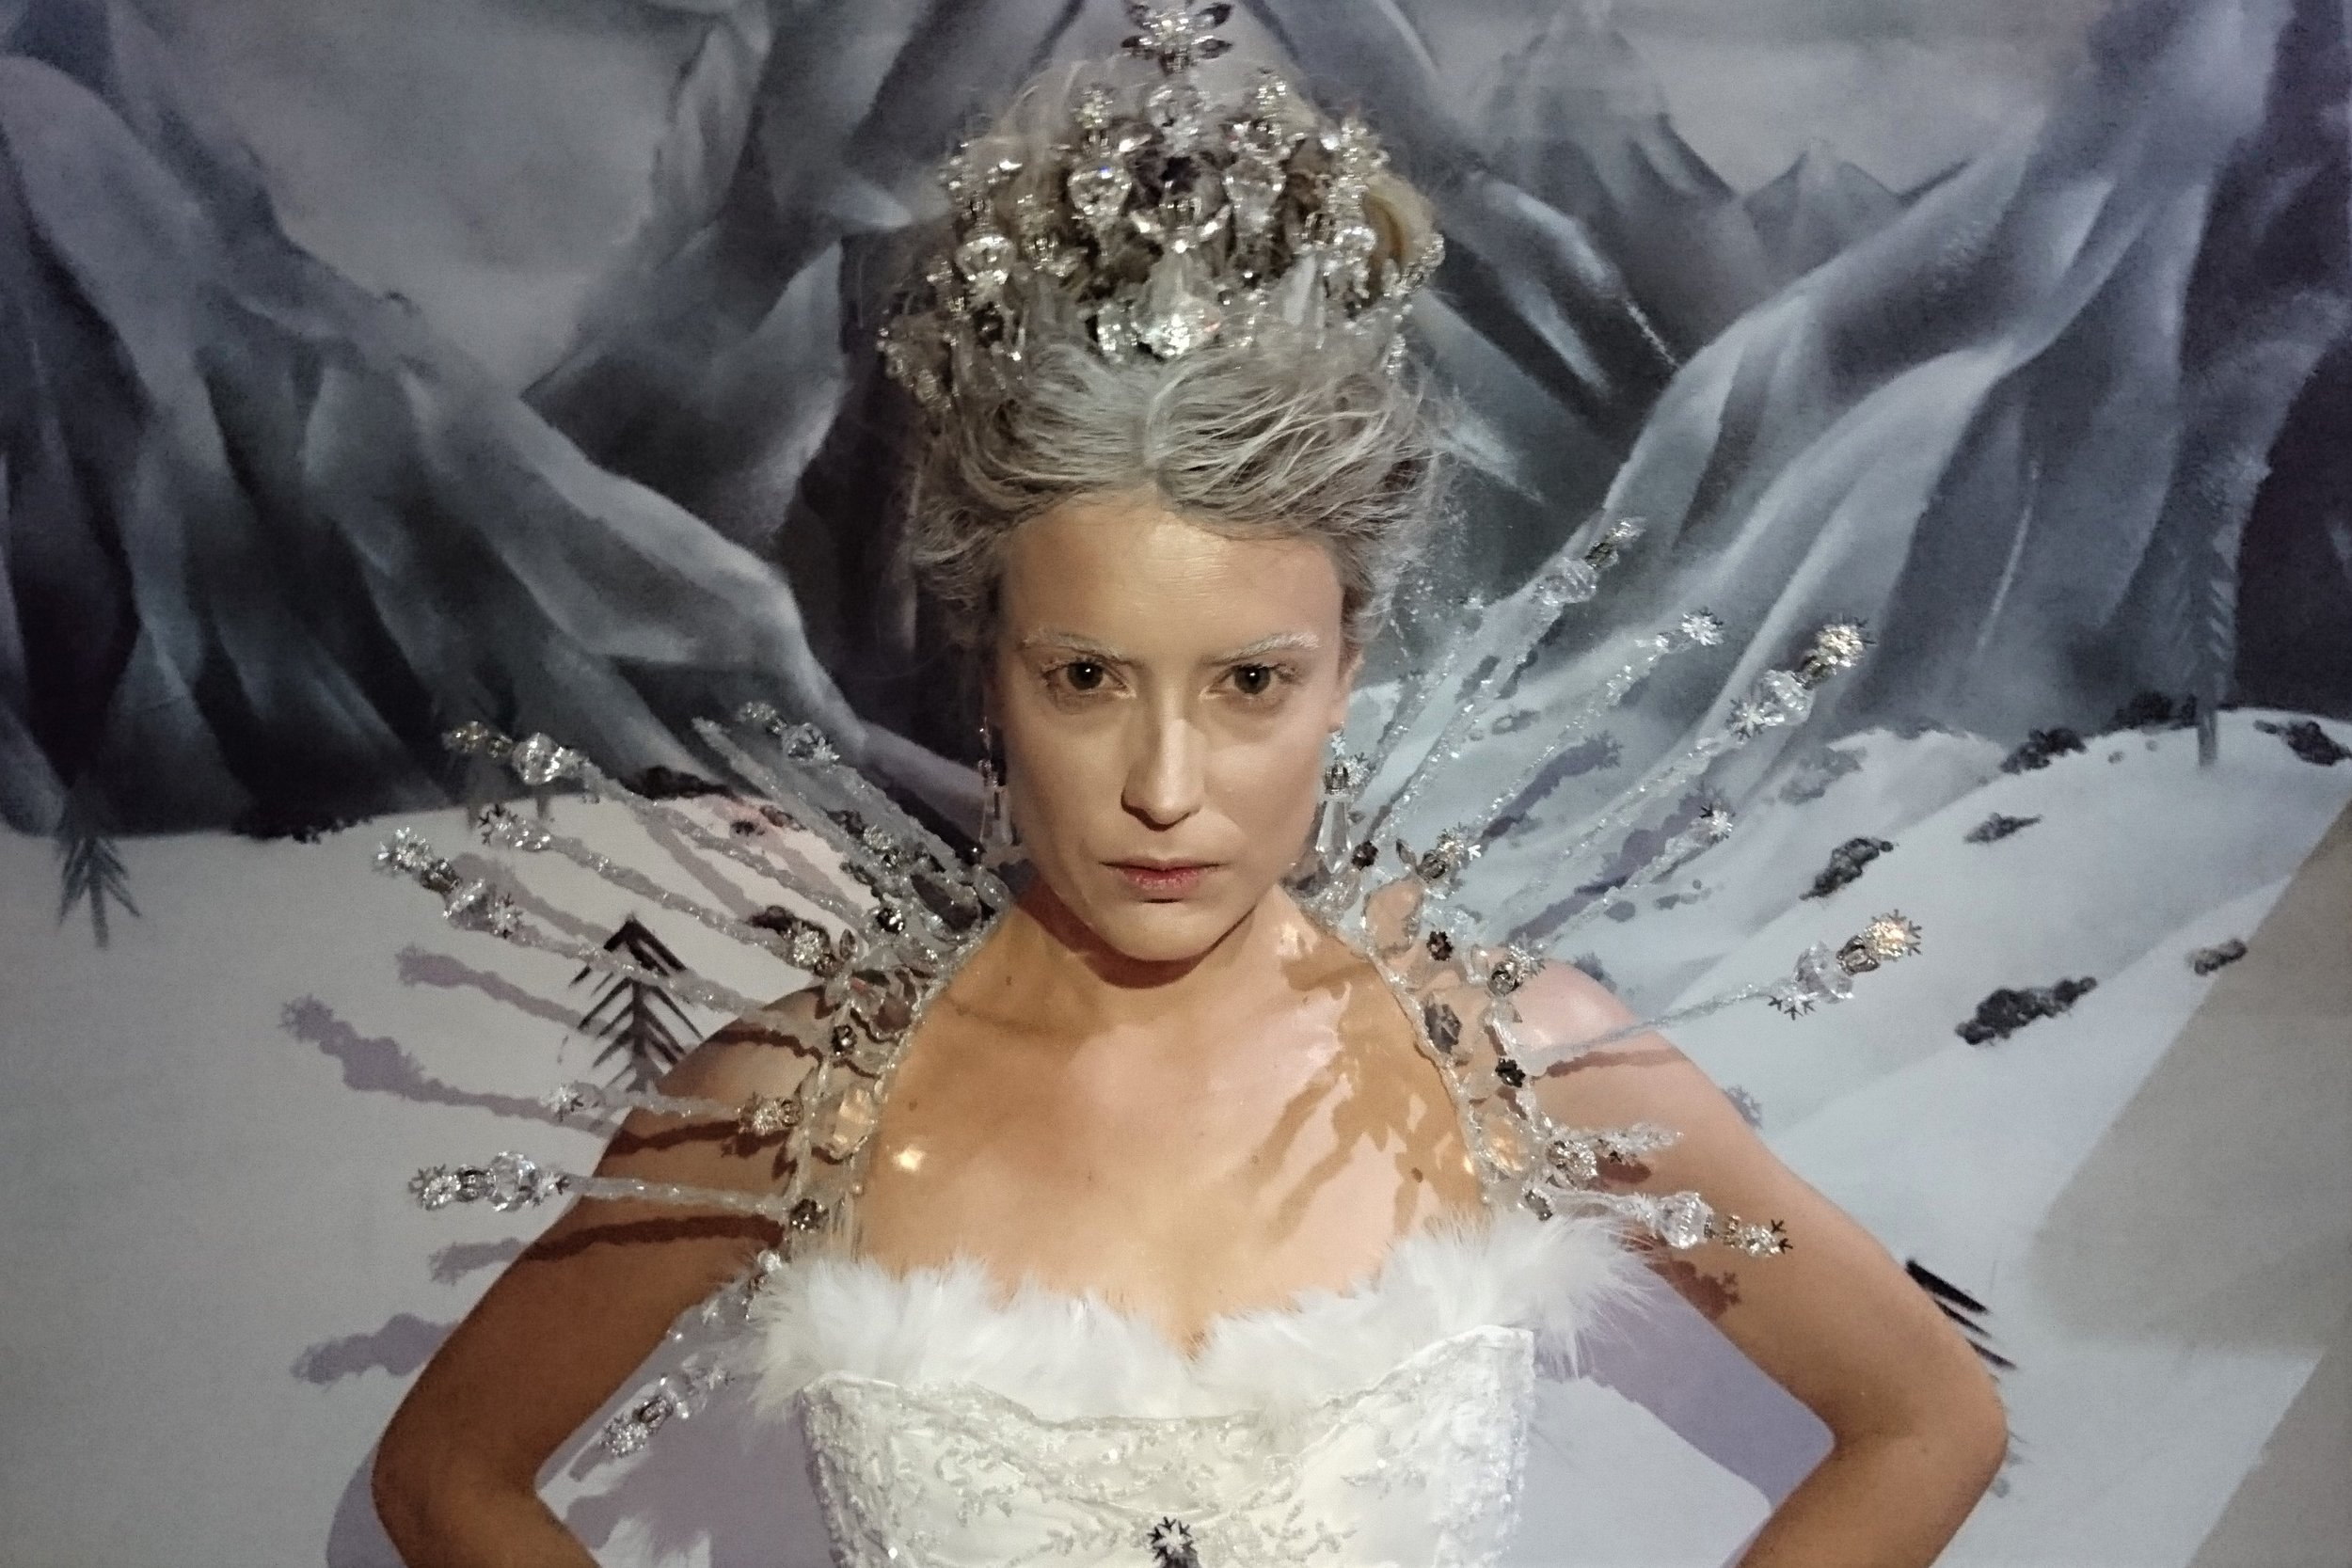 Costume - The Human Chameleon - Kristine Walker - Snow Queen - The Myster Rooms (1).jpg